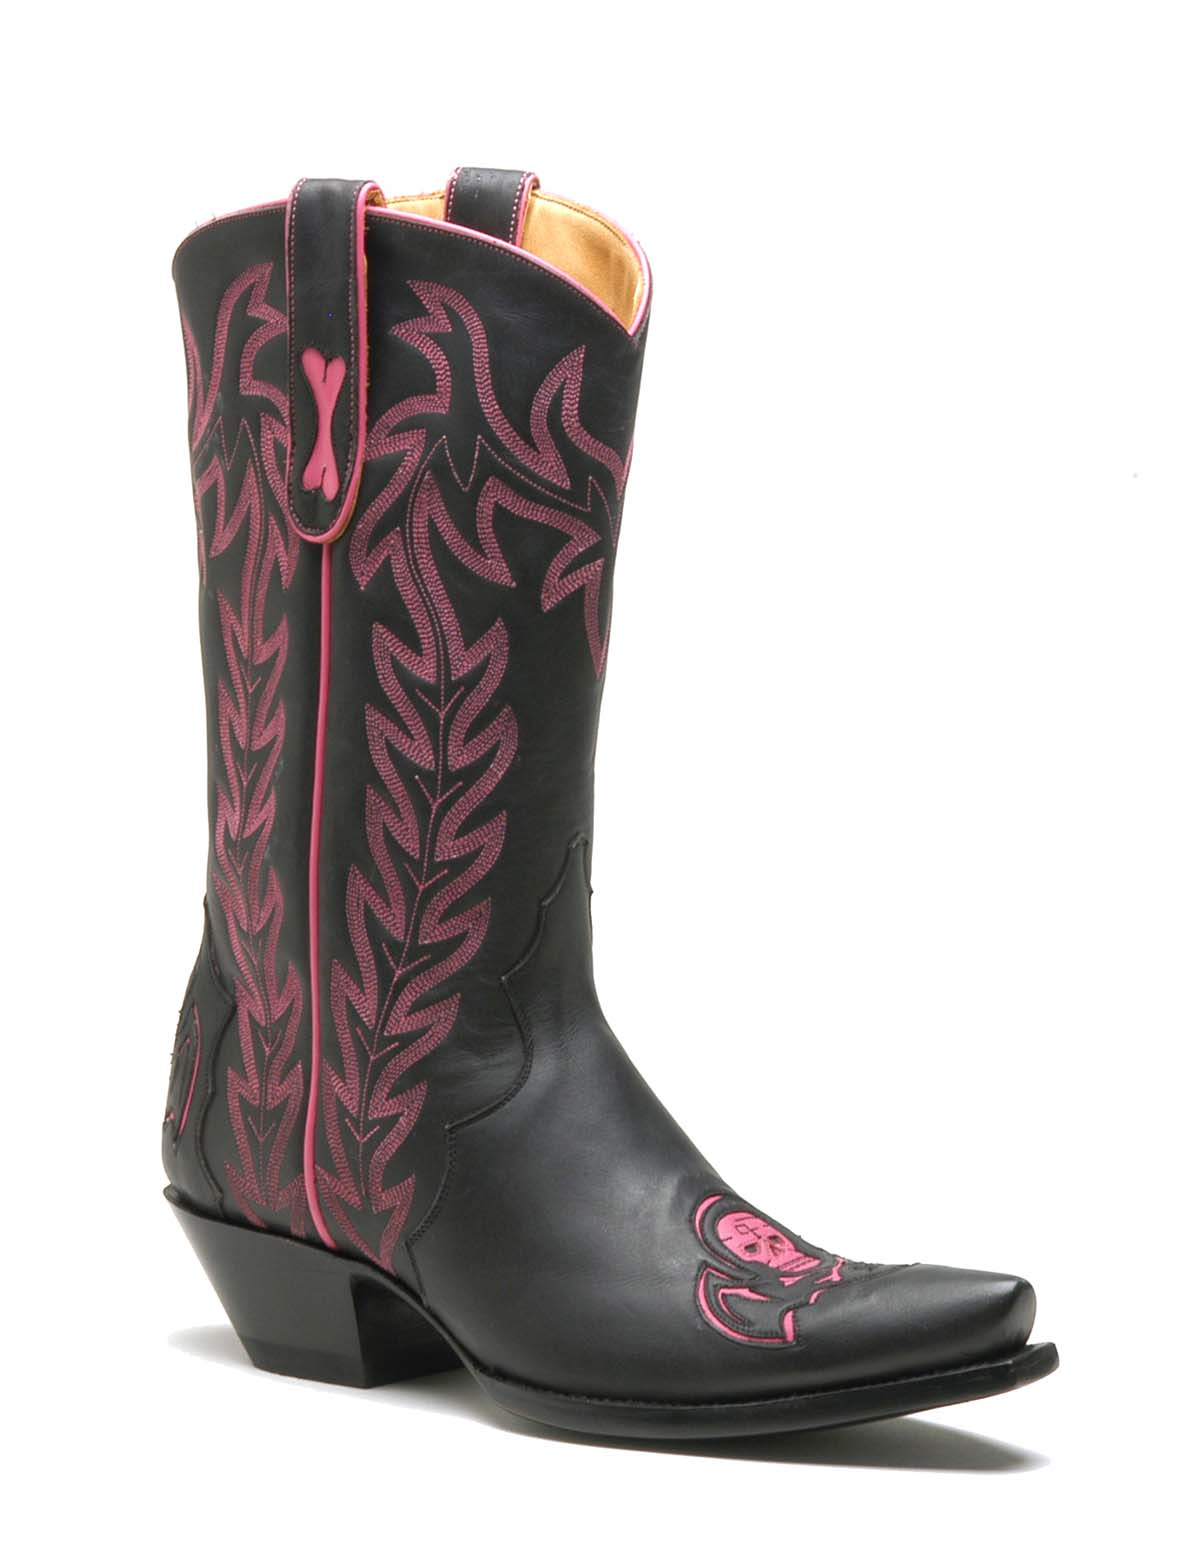 c30301fddd8 Killaz Rainbow - Handmade Cowboy Boots from Liberty Boot Co | I'm ...